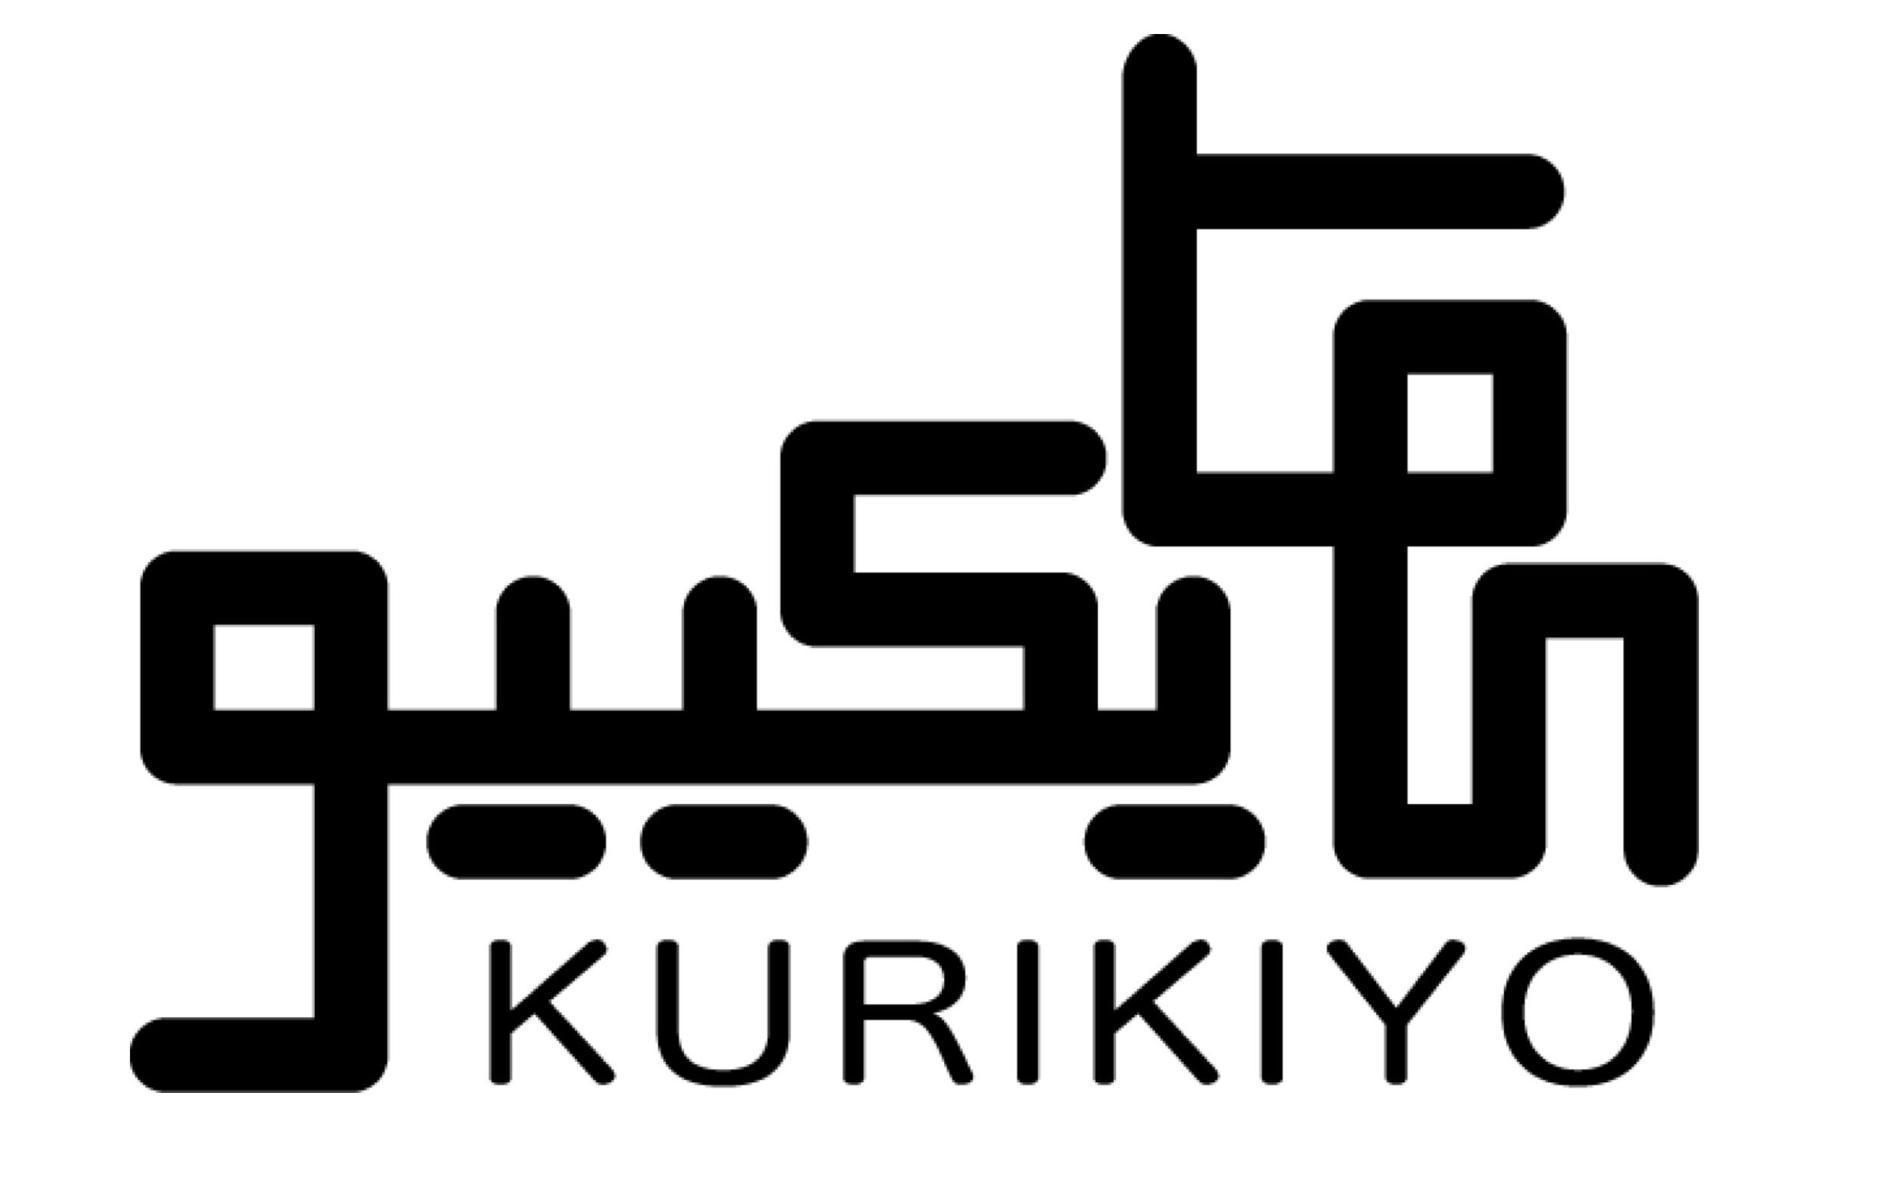 Kurikiyo Design & Art